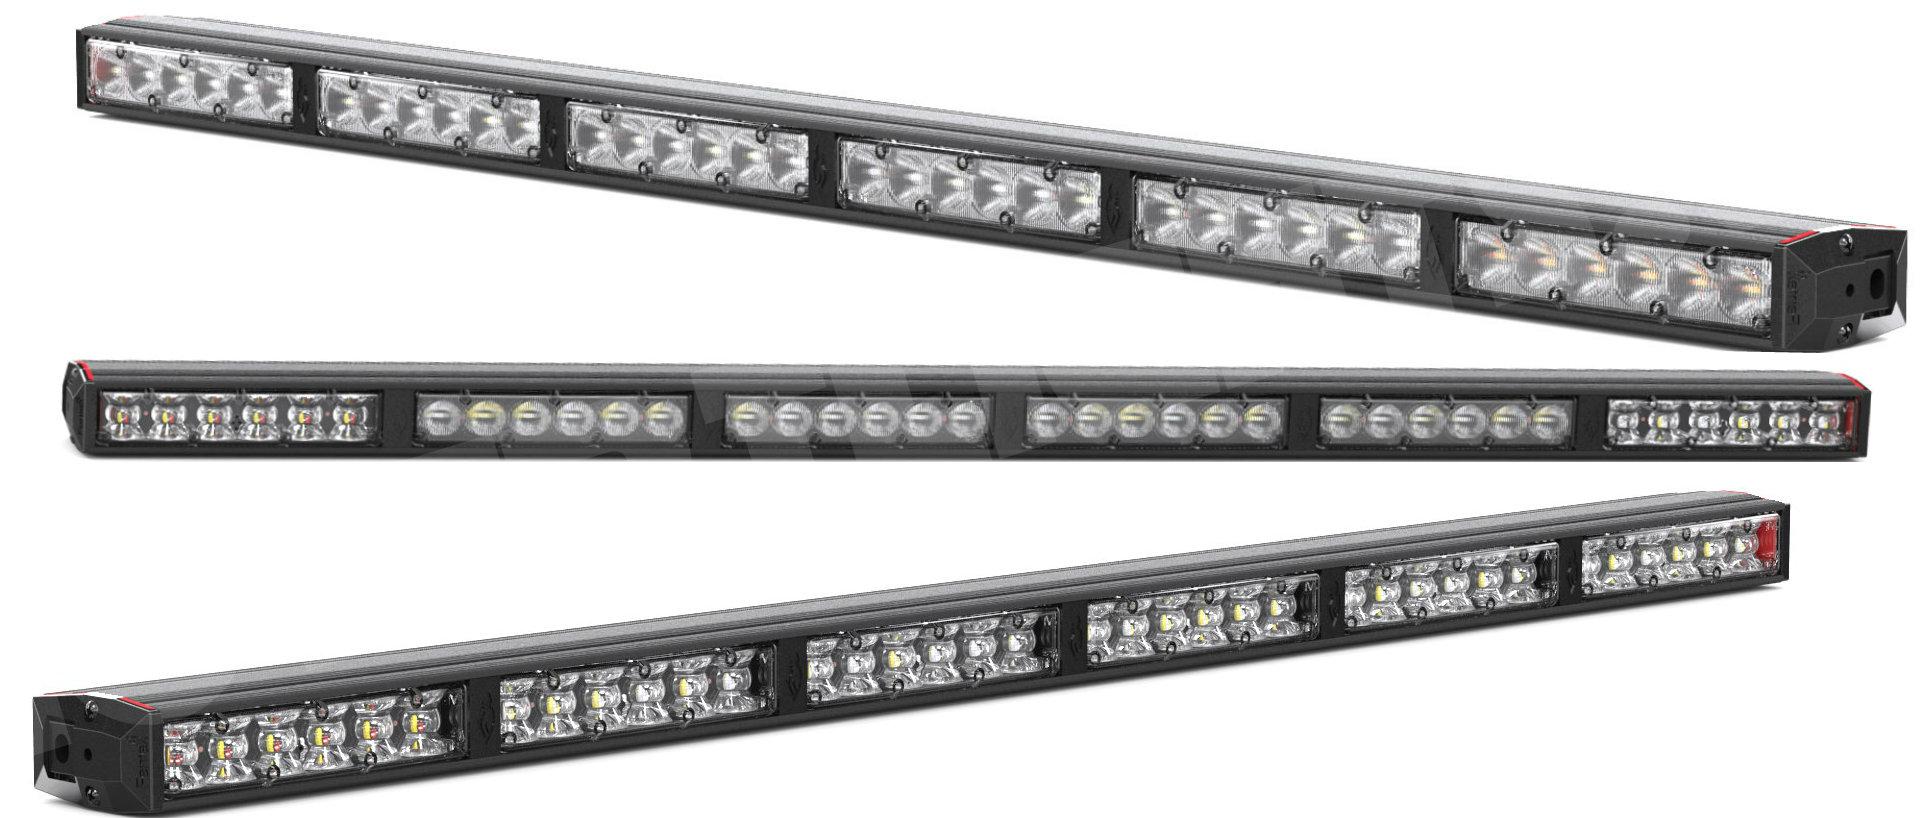 feniex-fusion-600-lightstick-40-180-40180.jpg